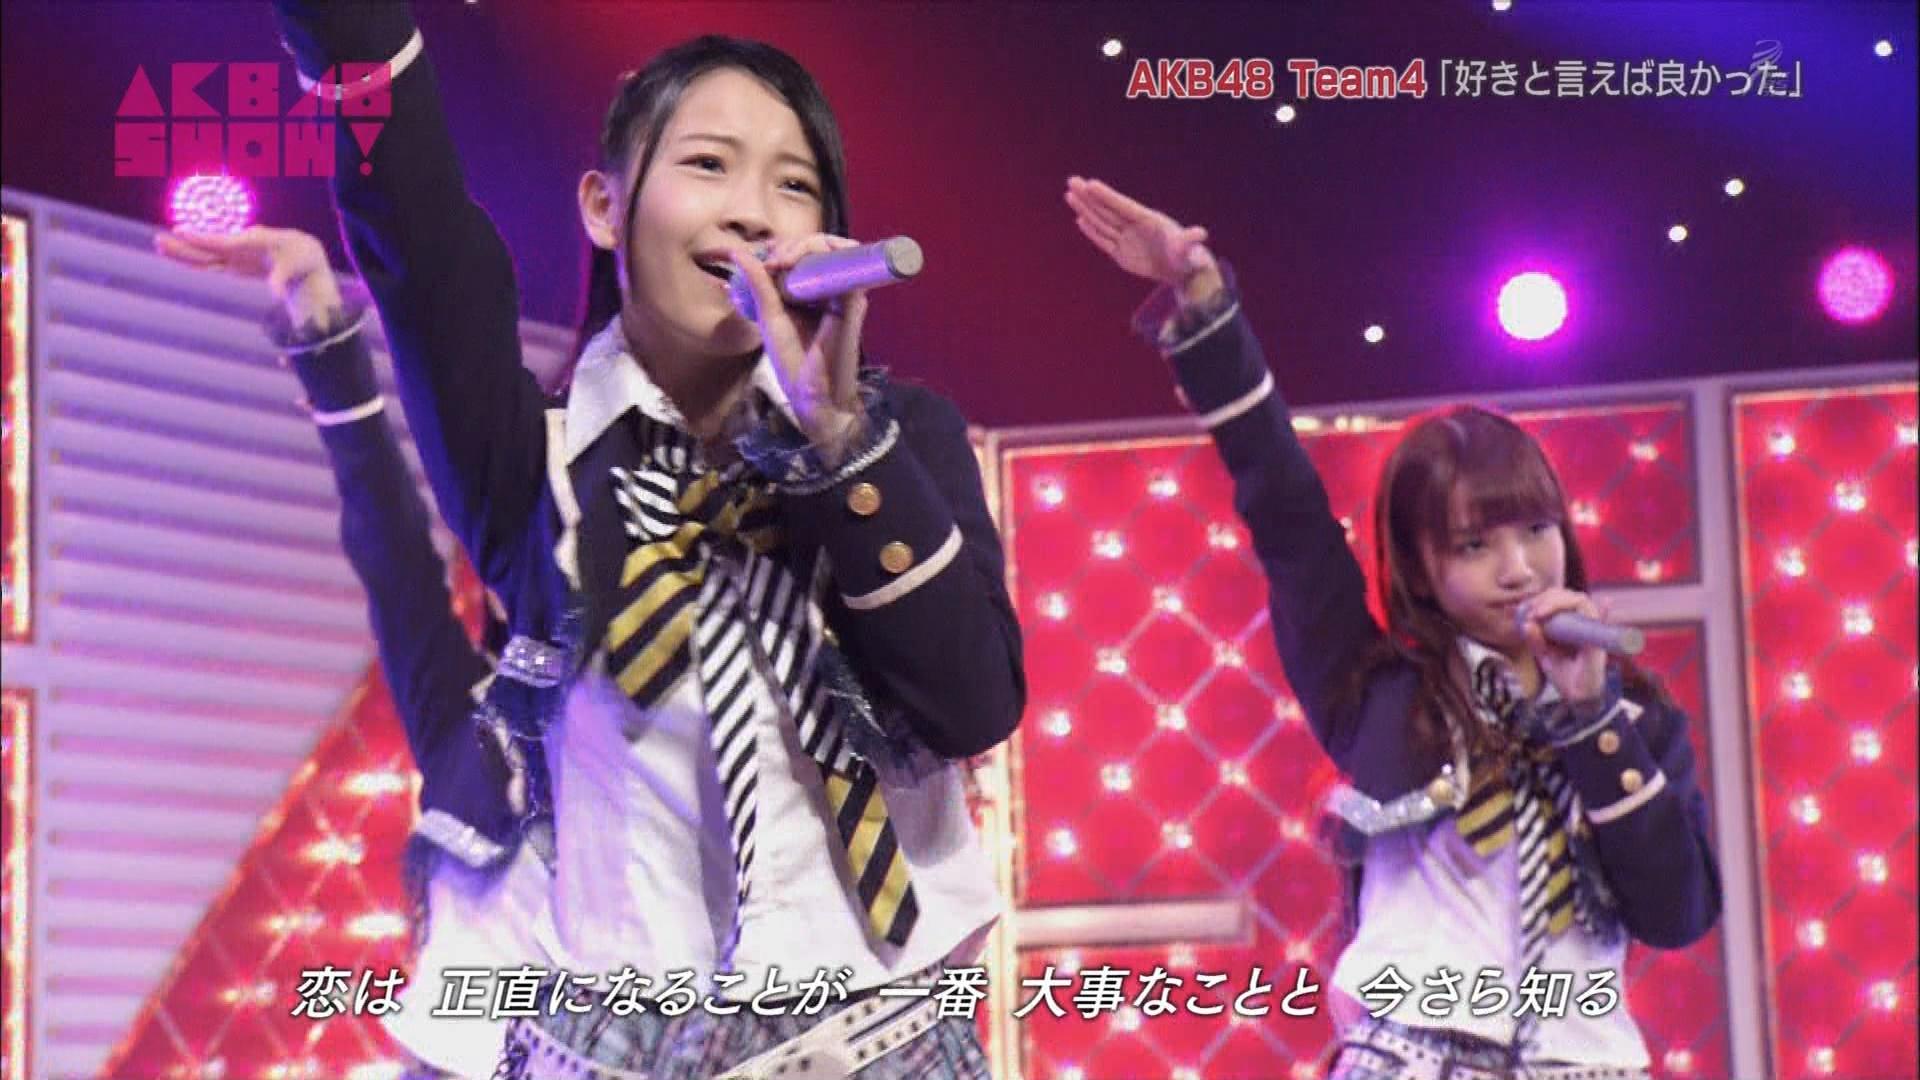 AKB48SHOW チーム4好きといえば良かった 加藤玲奈 20140830 (11)